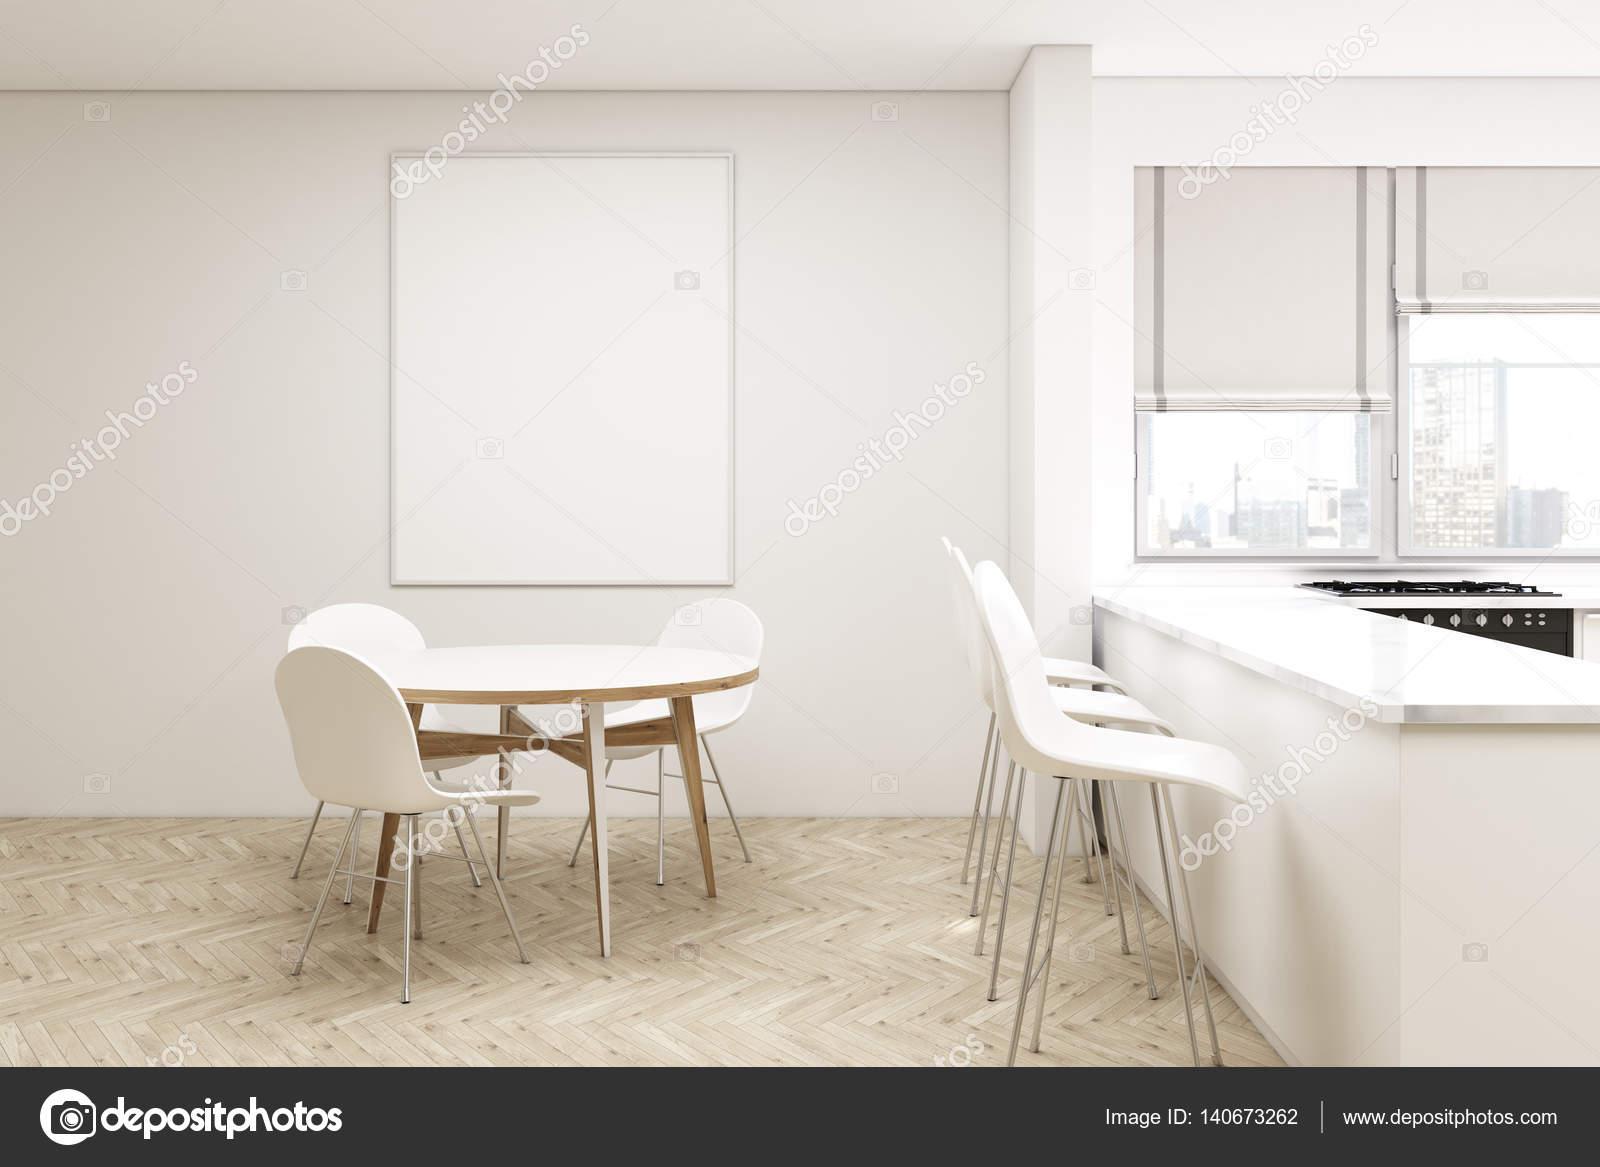 Cozinha Compacta Com Mesa Redonda Stock Photo Denisismagilov